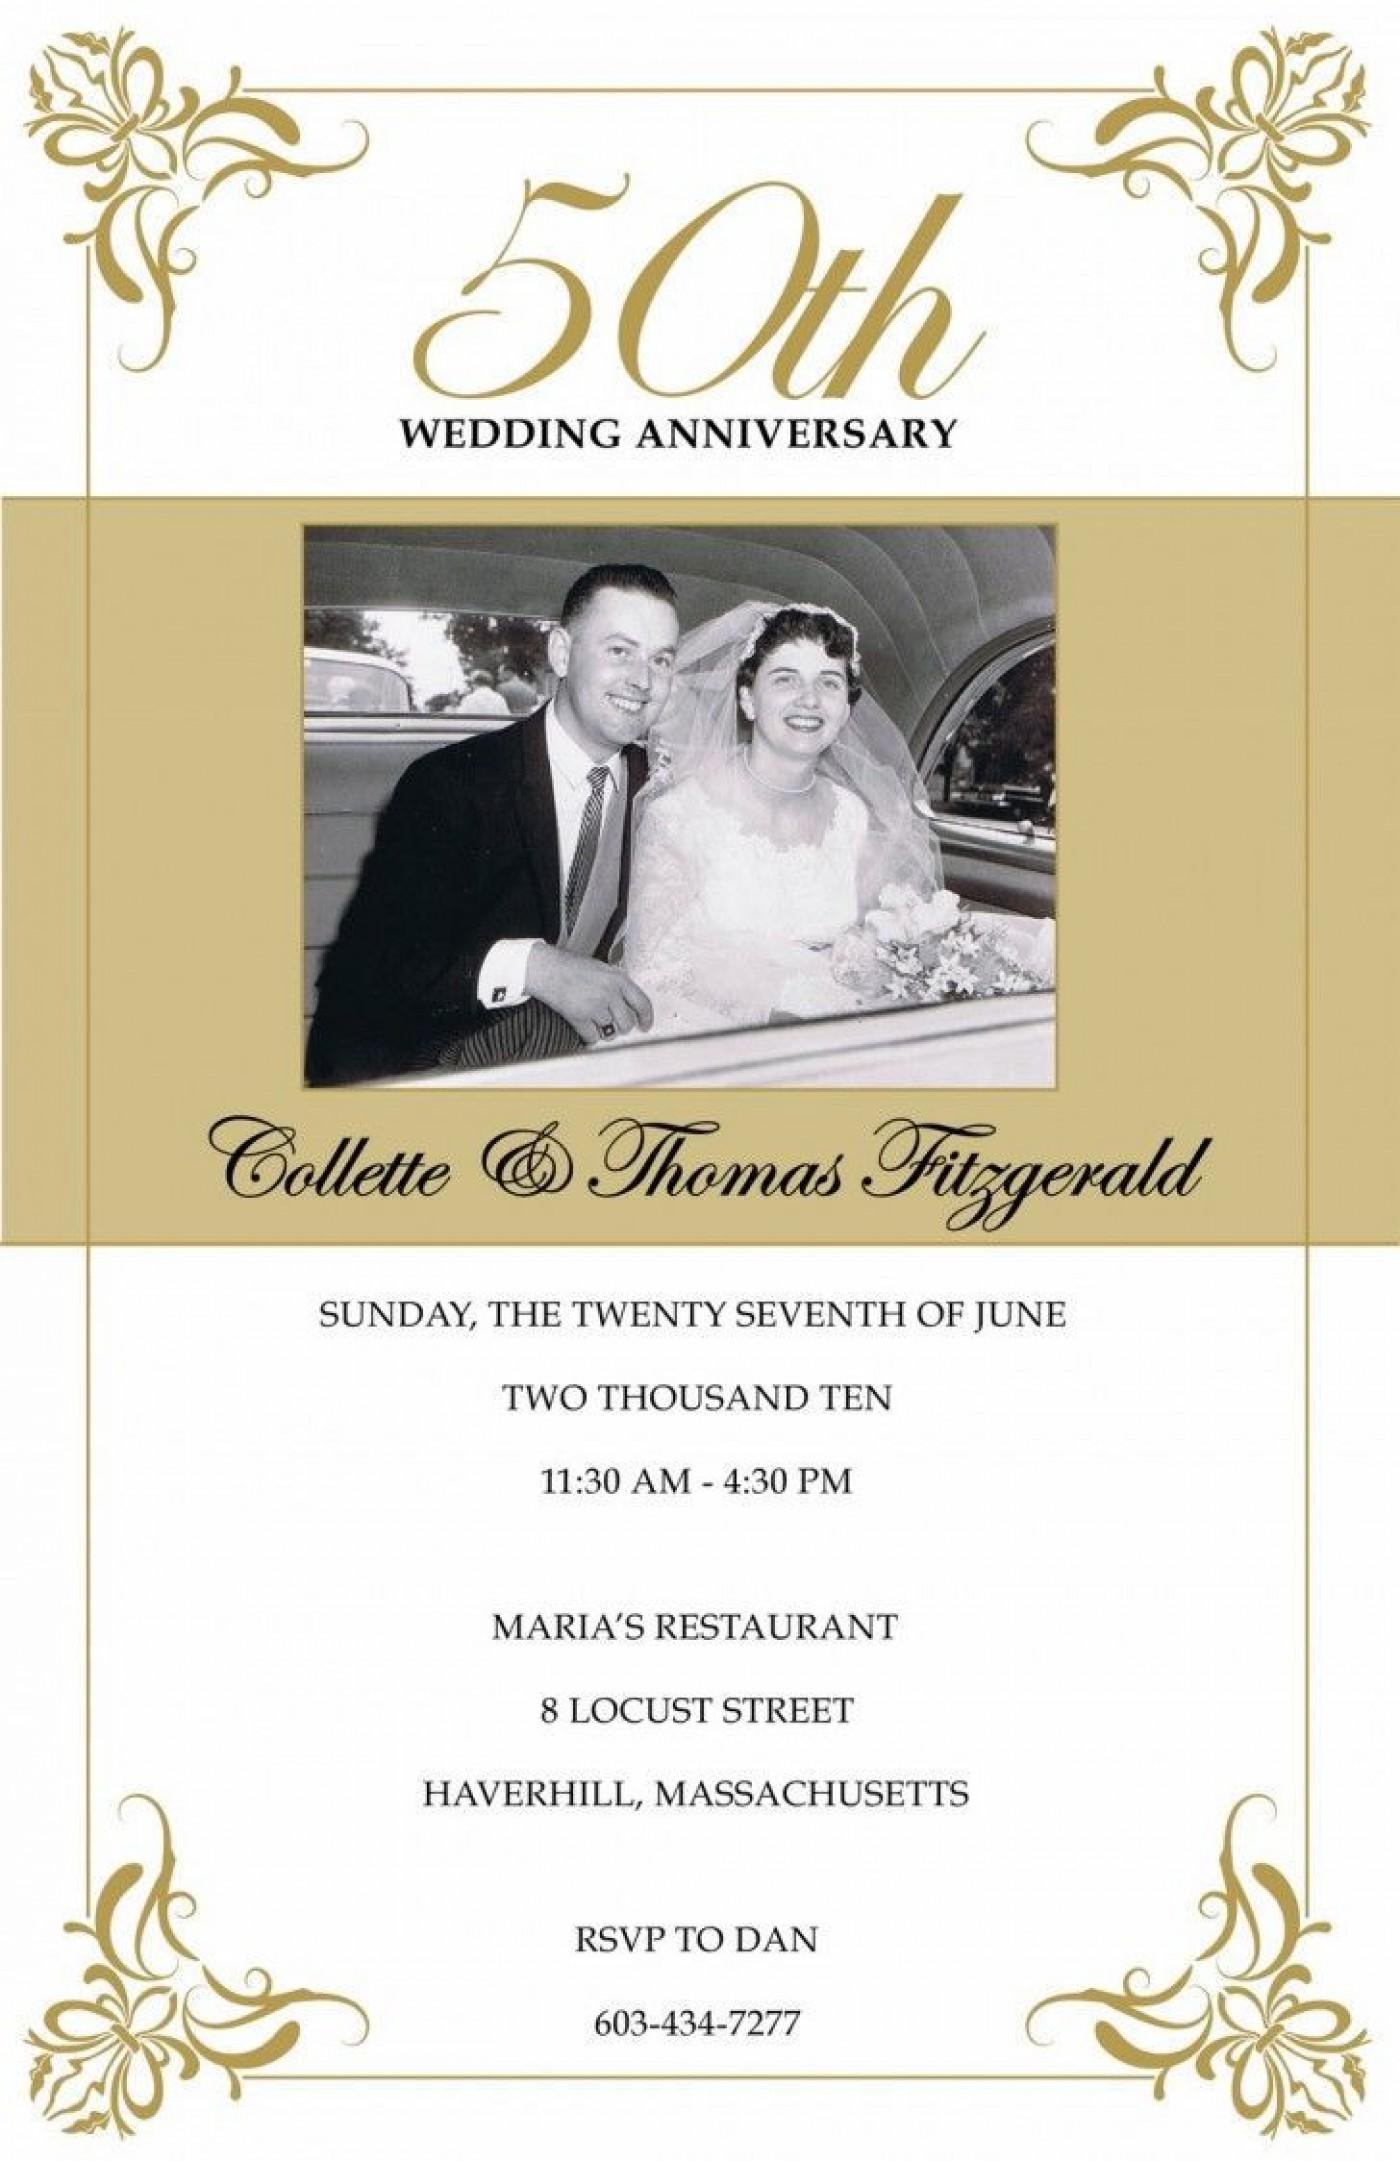 006 Shocking 50th Anniversary Invitation Wording Sample  Wedding 60th In Tamil Birthday1400